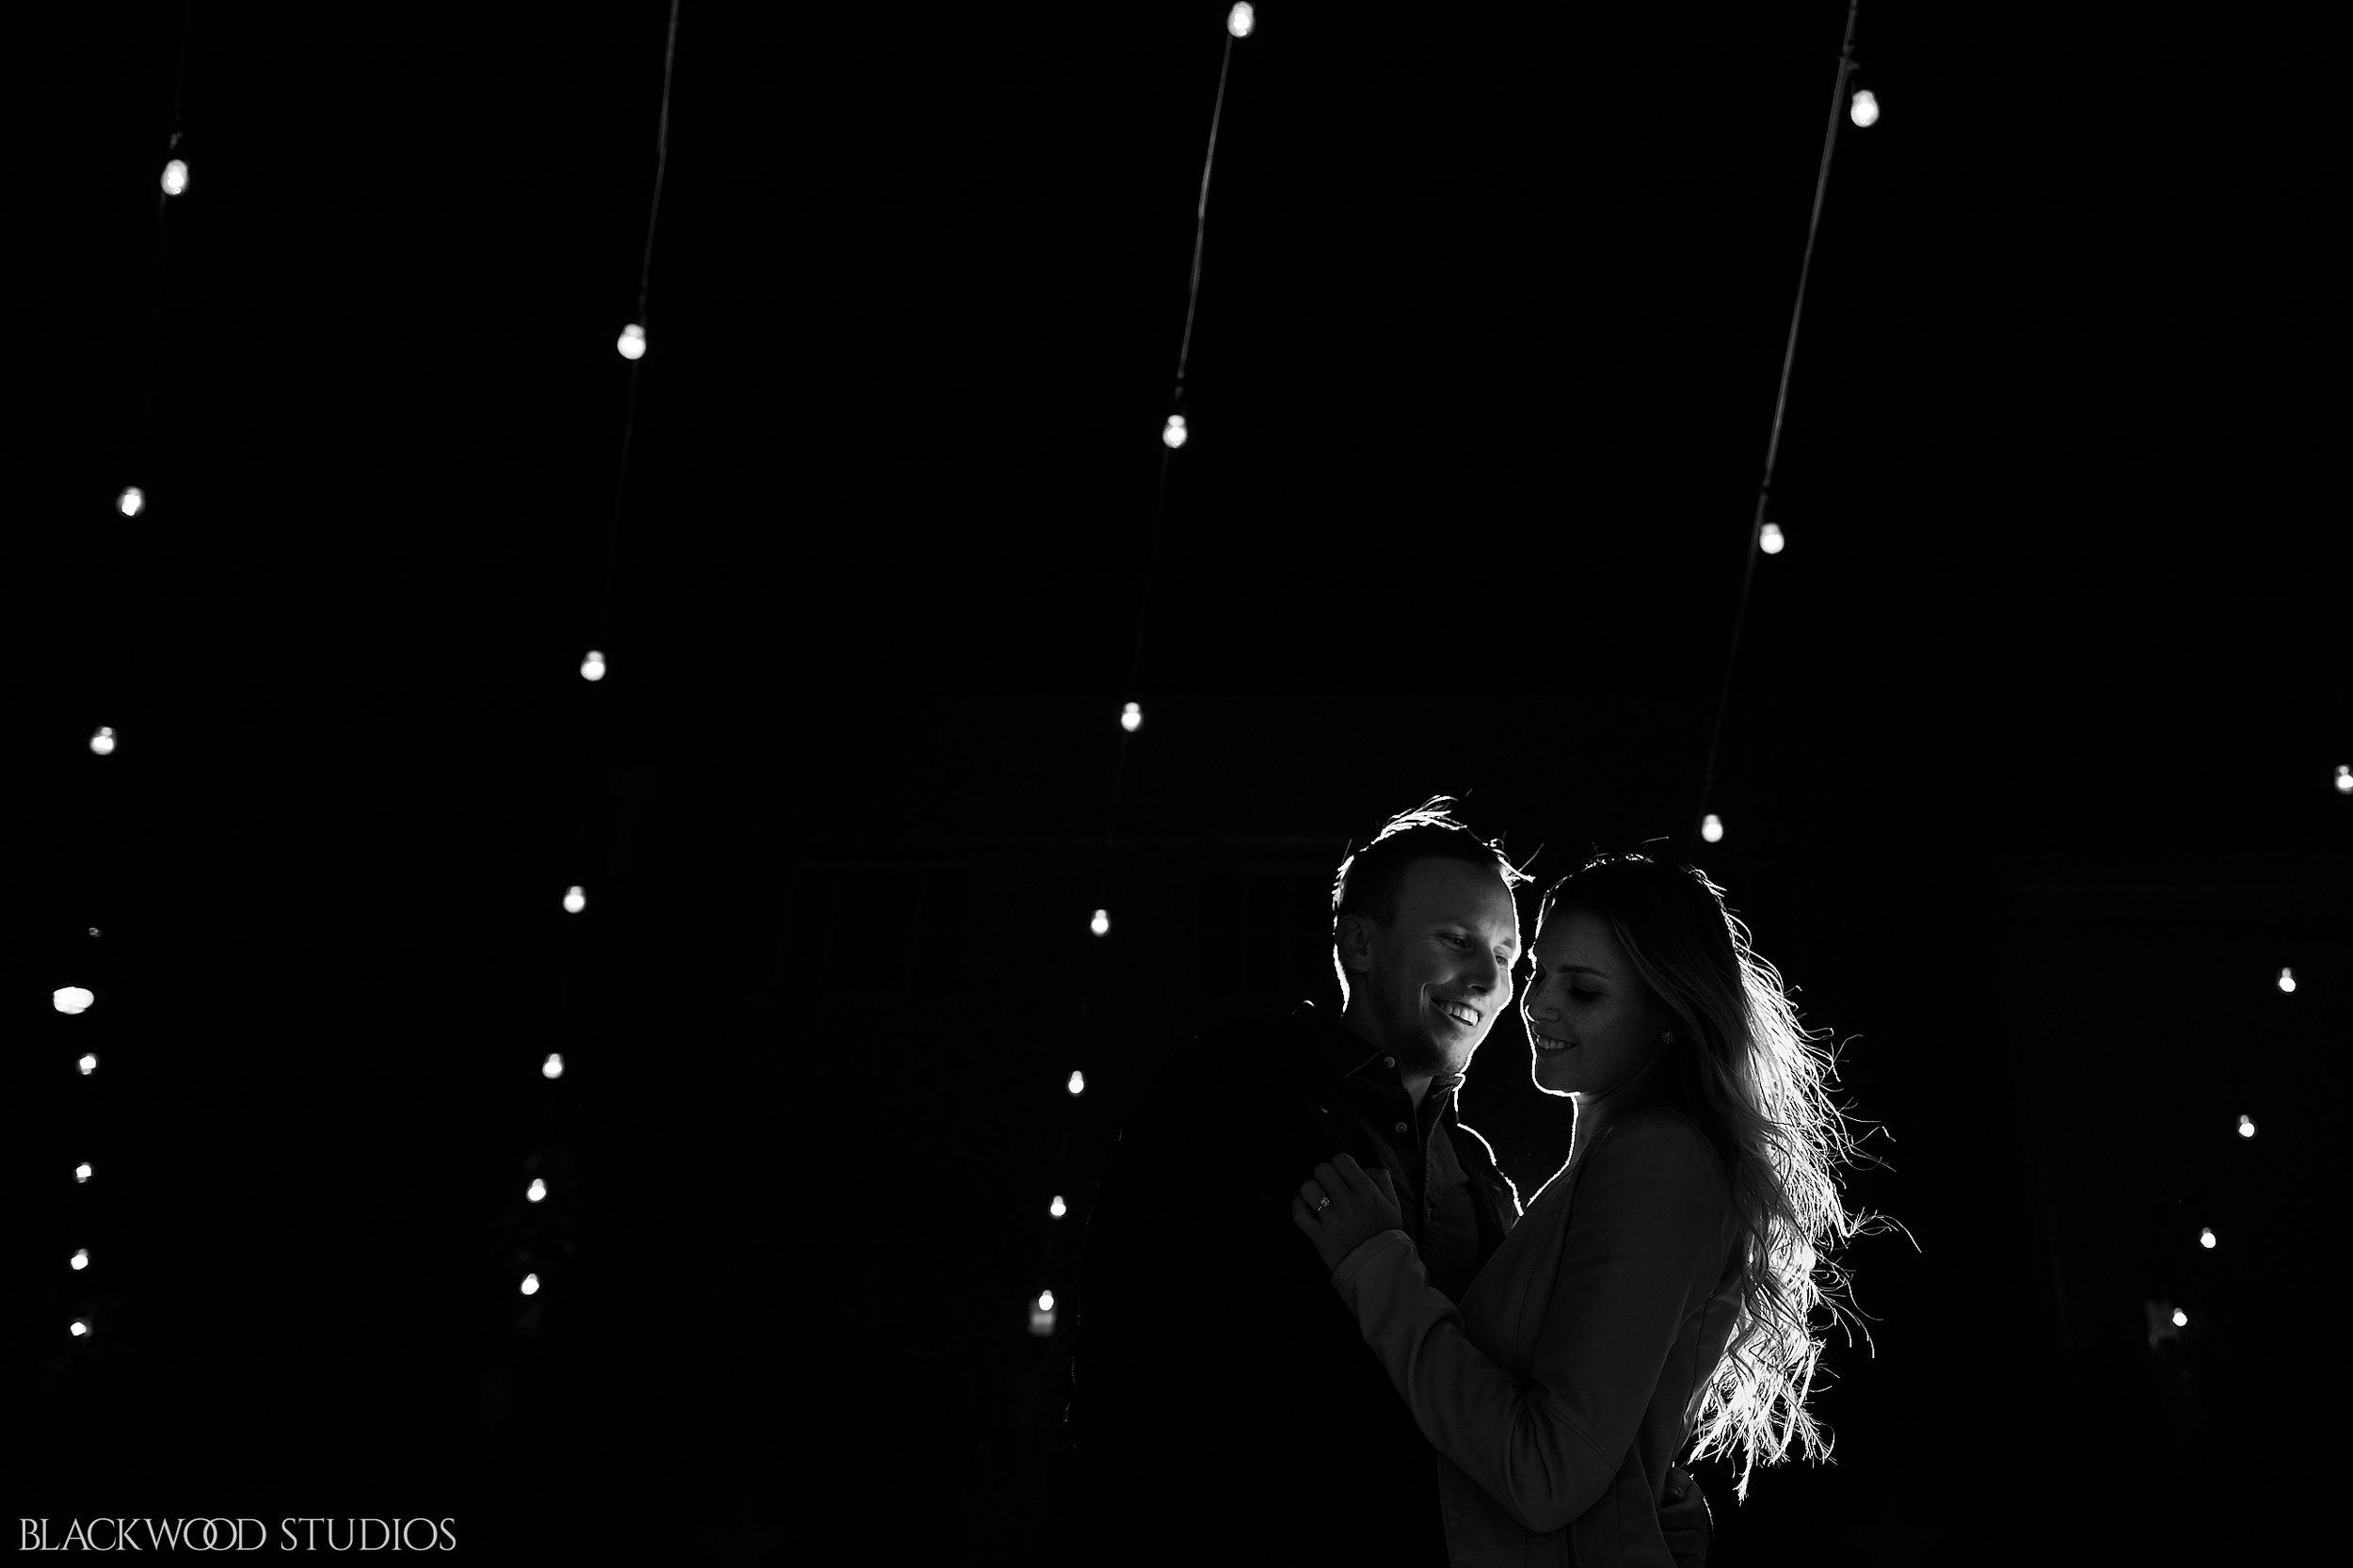 Blackwood-Studios-20181012-192503-Aleisha-and-Brad-Engagement-photography-Toronto-Ontario-Canada.jpg